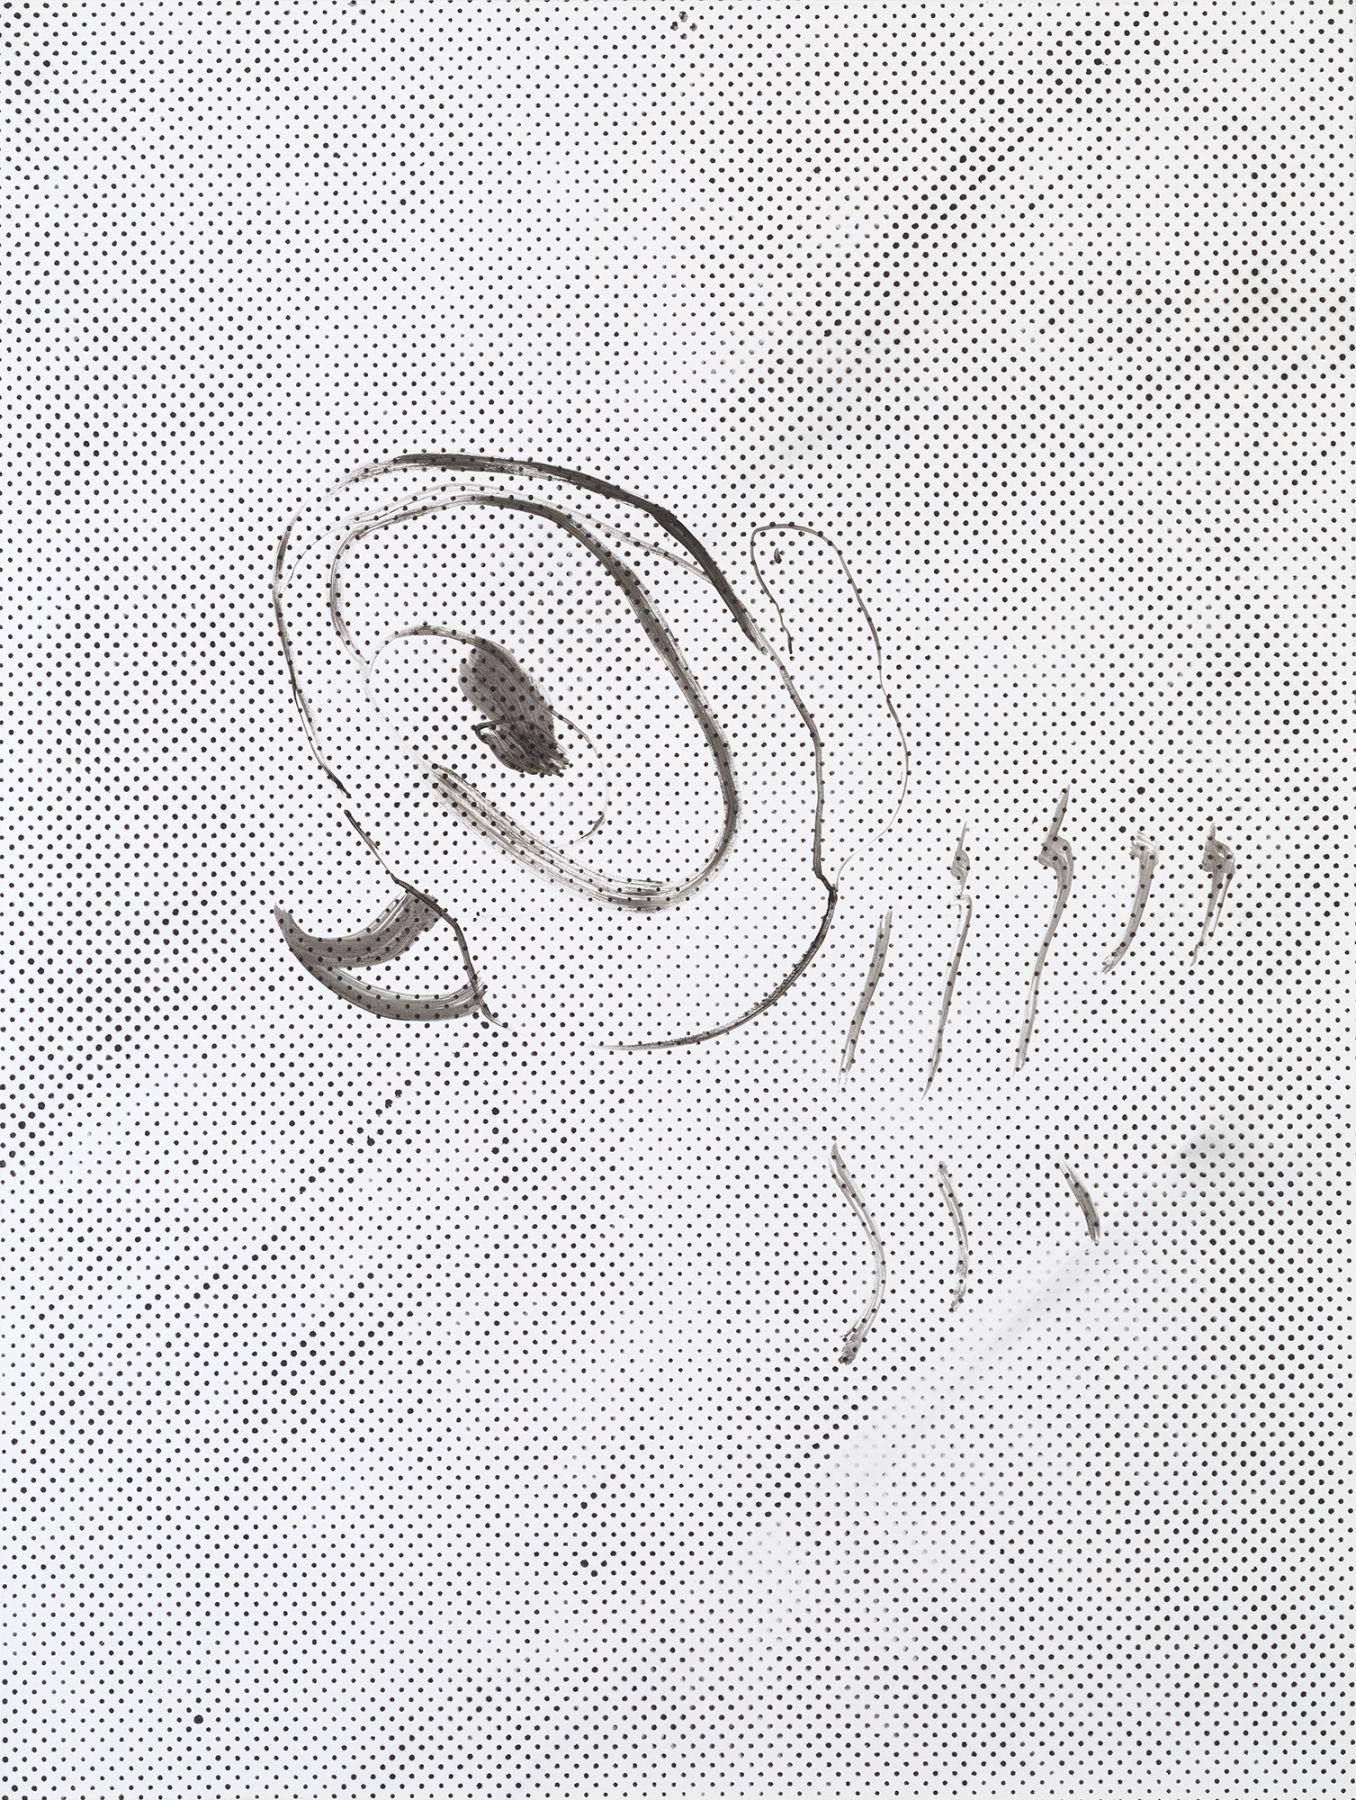 Michael Krebber MK.283, 2015 Lacquer on canvas 78 3/4 x 59 1/8 inches (200 x 150.2 cm)